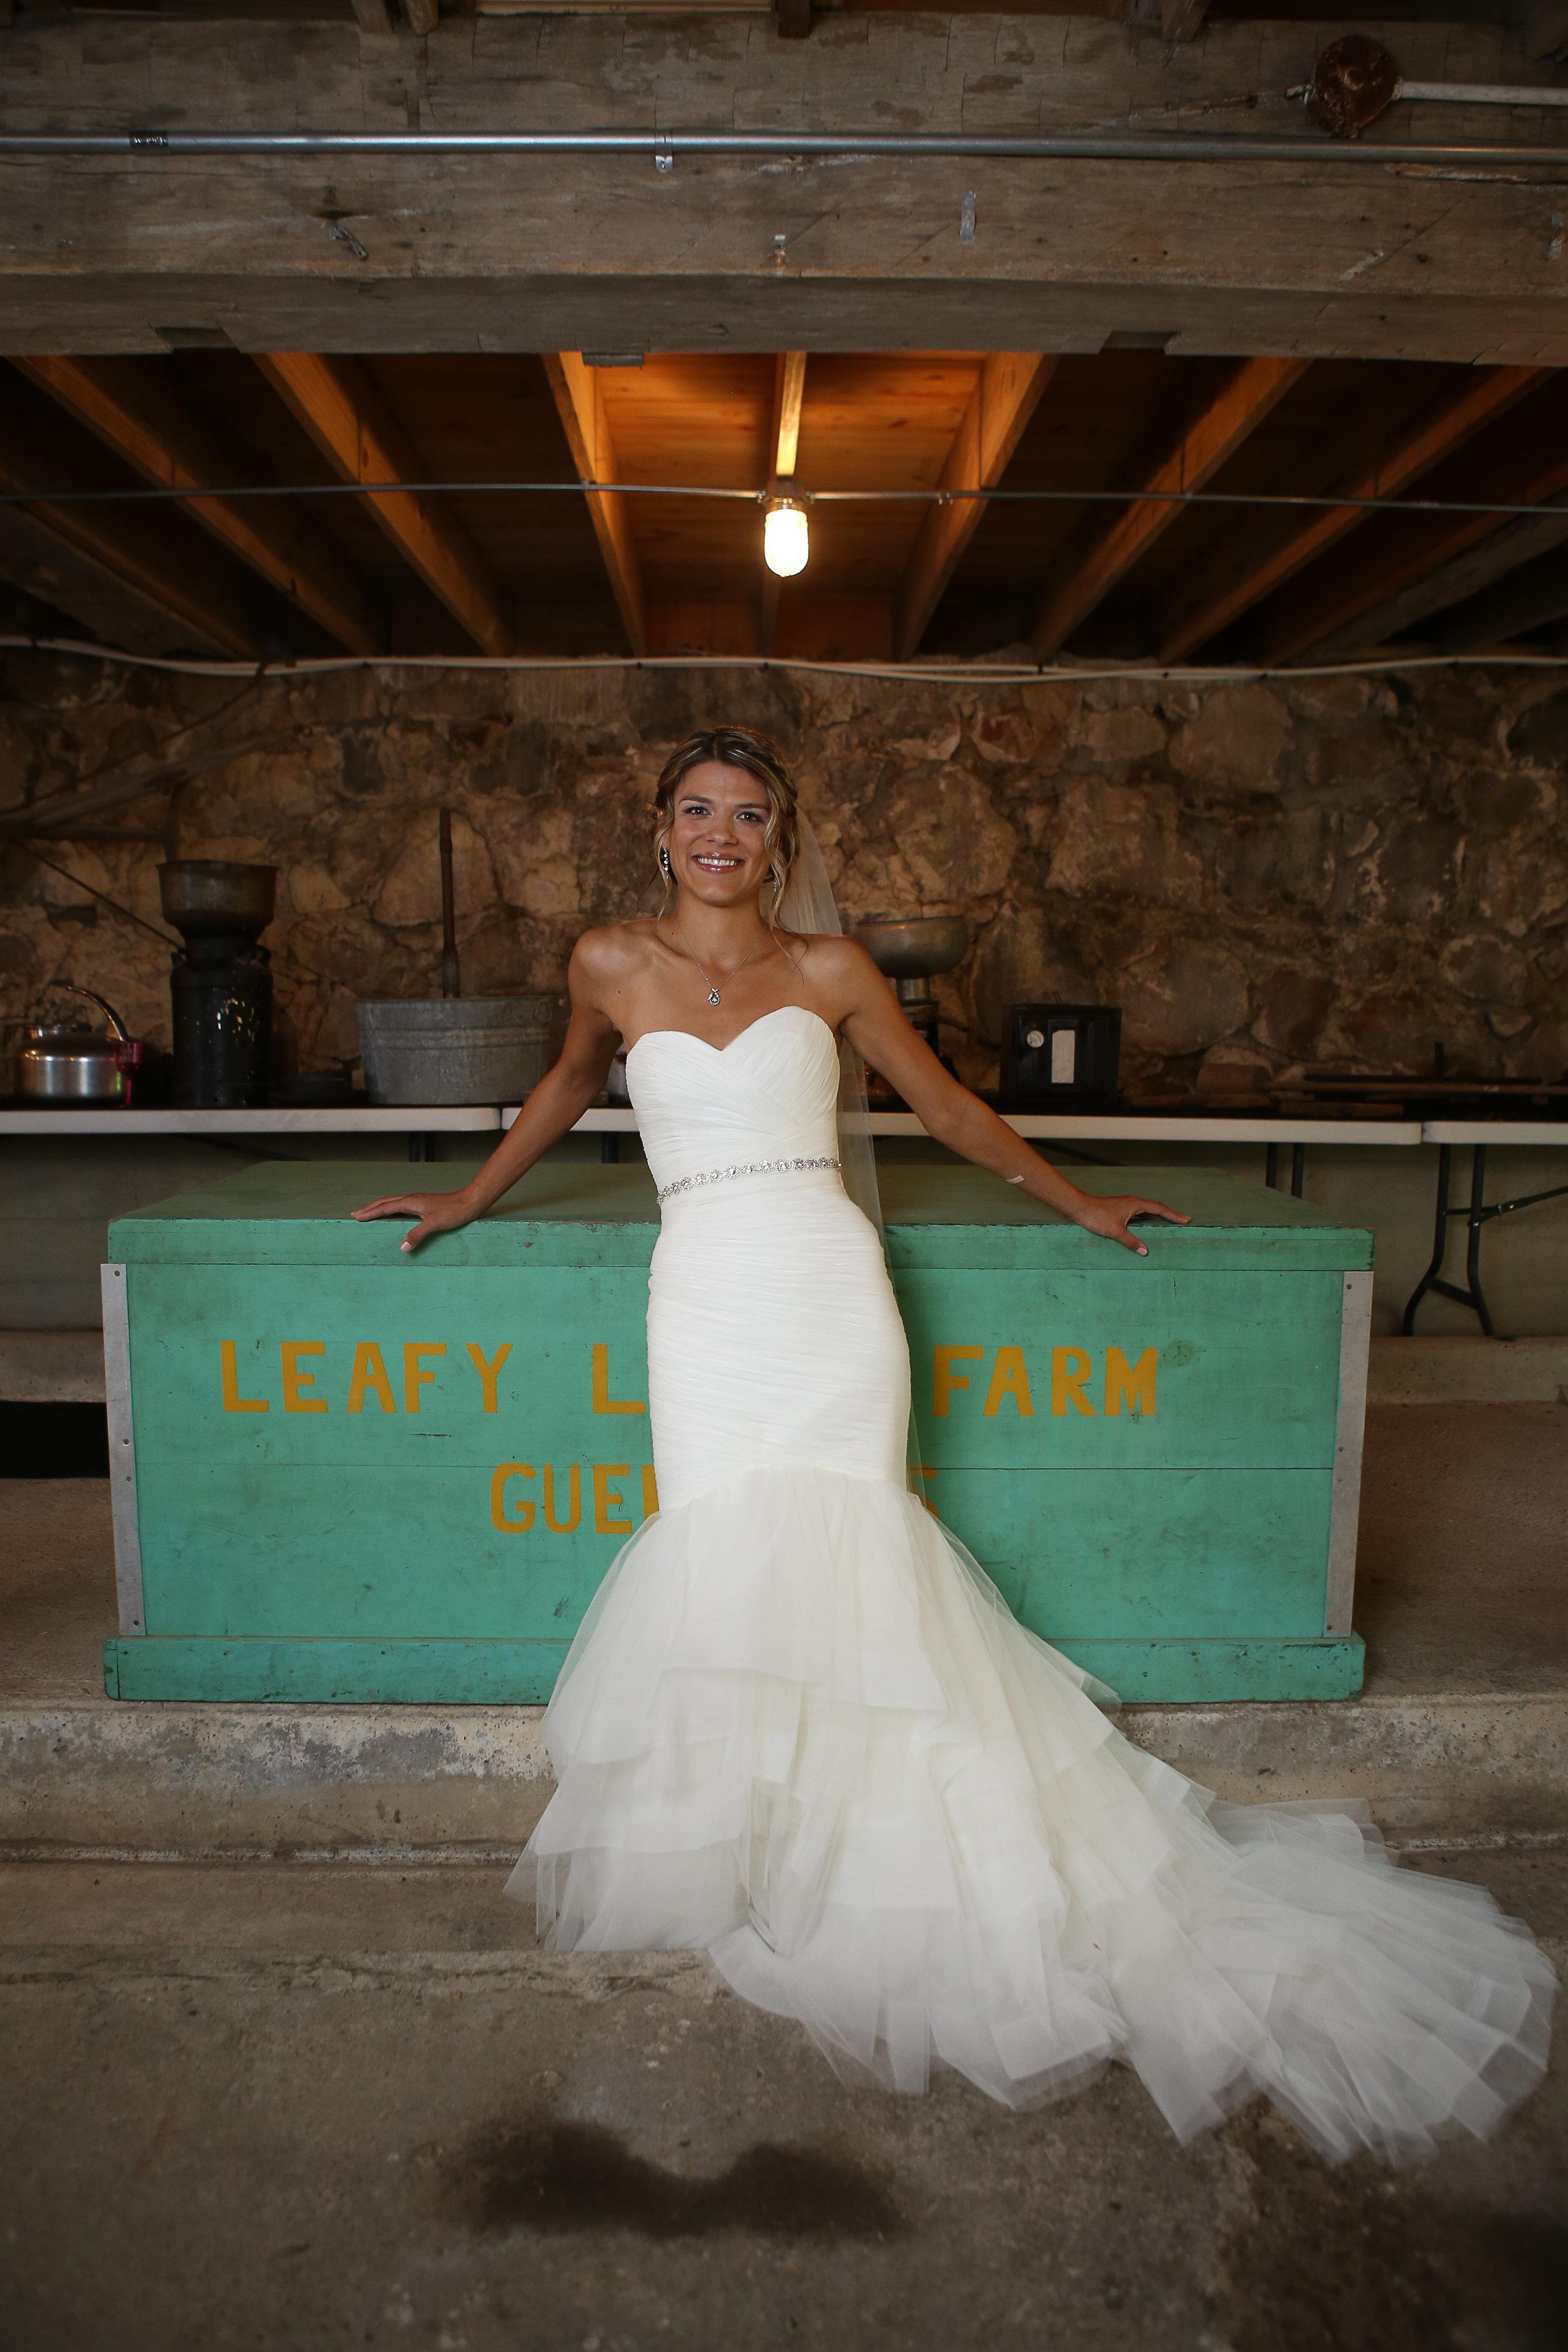 Beautiful Bride on her wedding day in a rustic Barn wedding